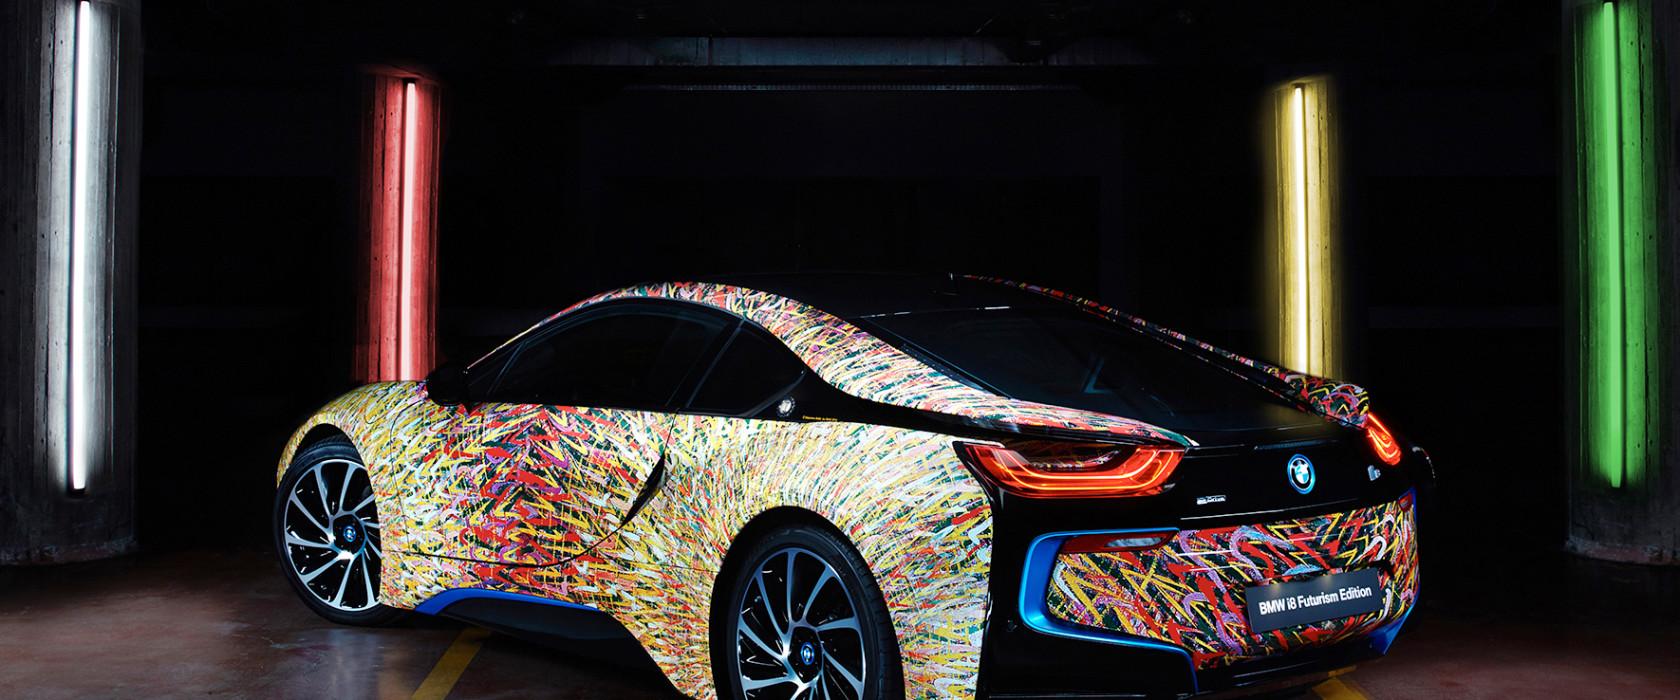 BMW_i8_Futurism_Edition05